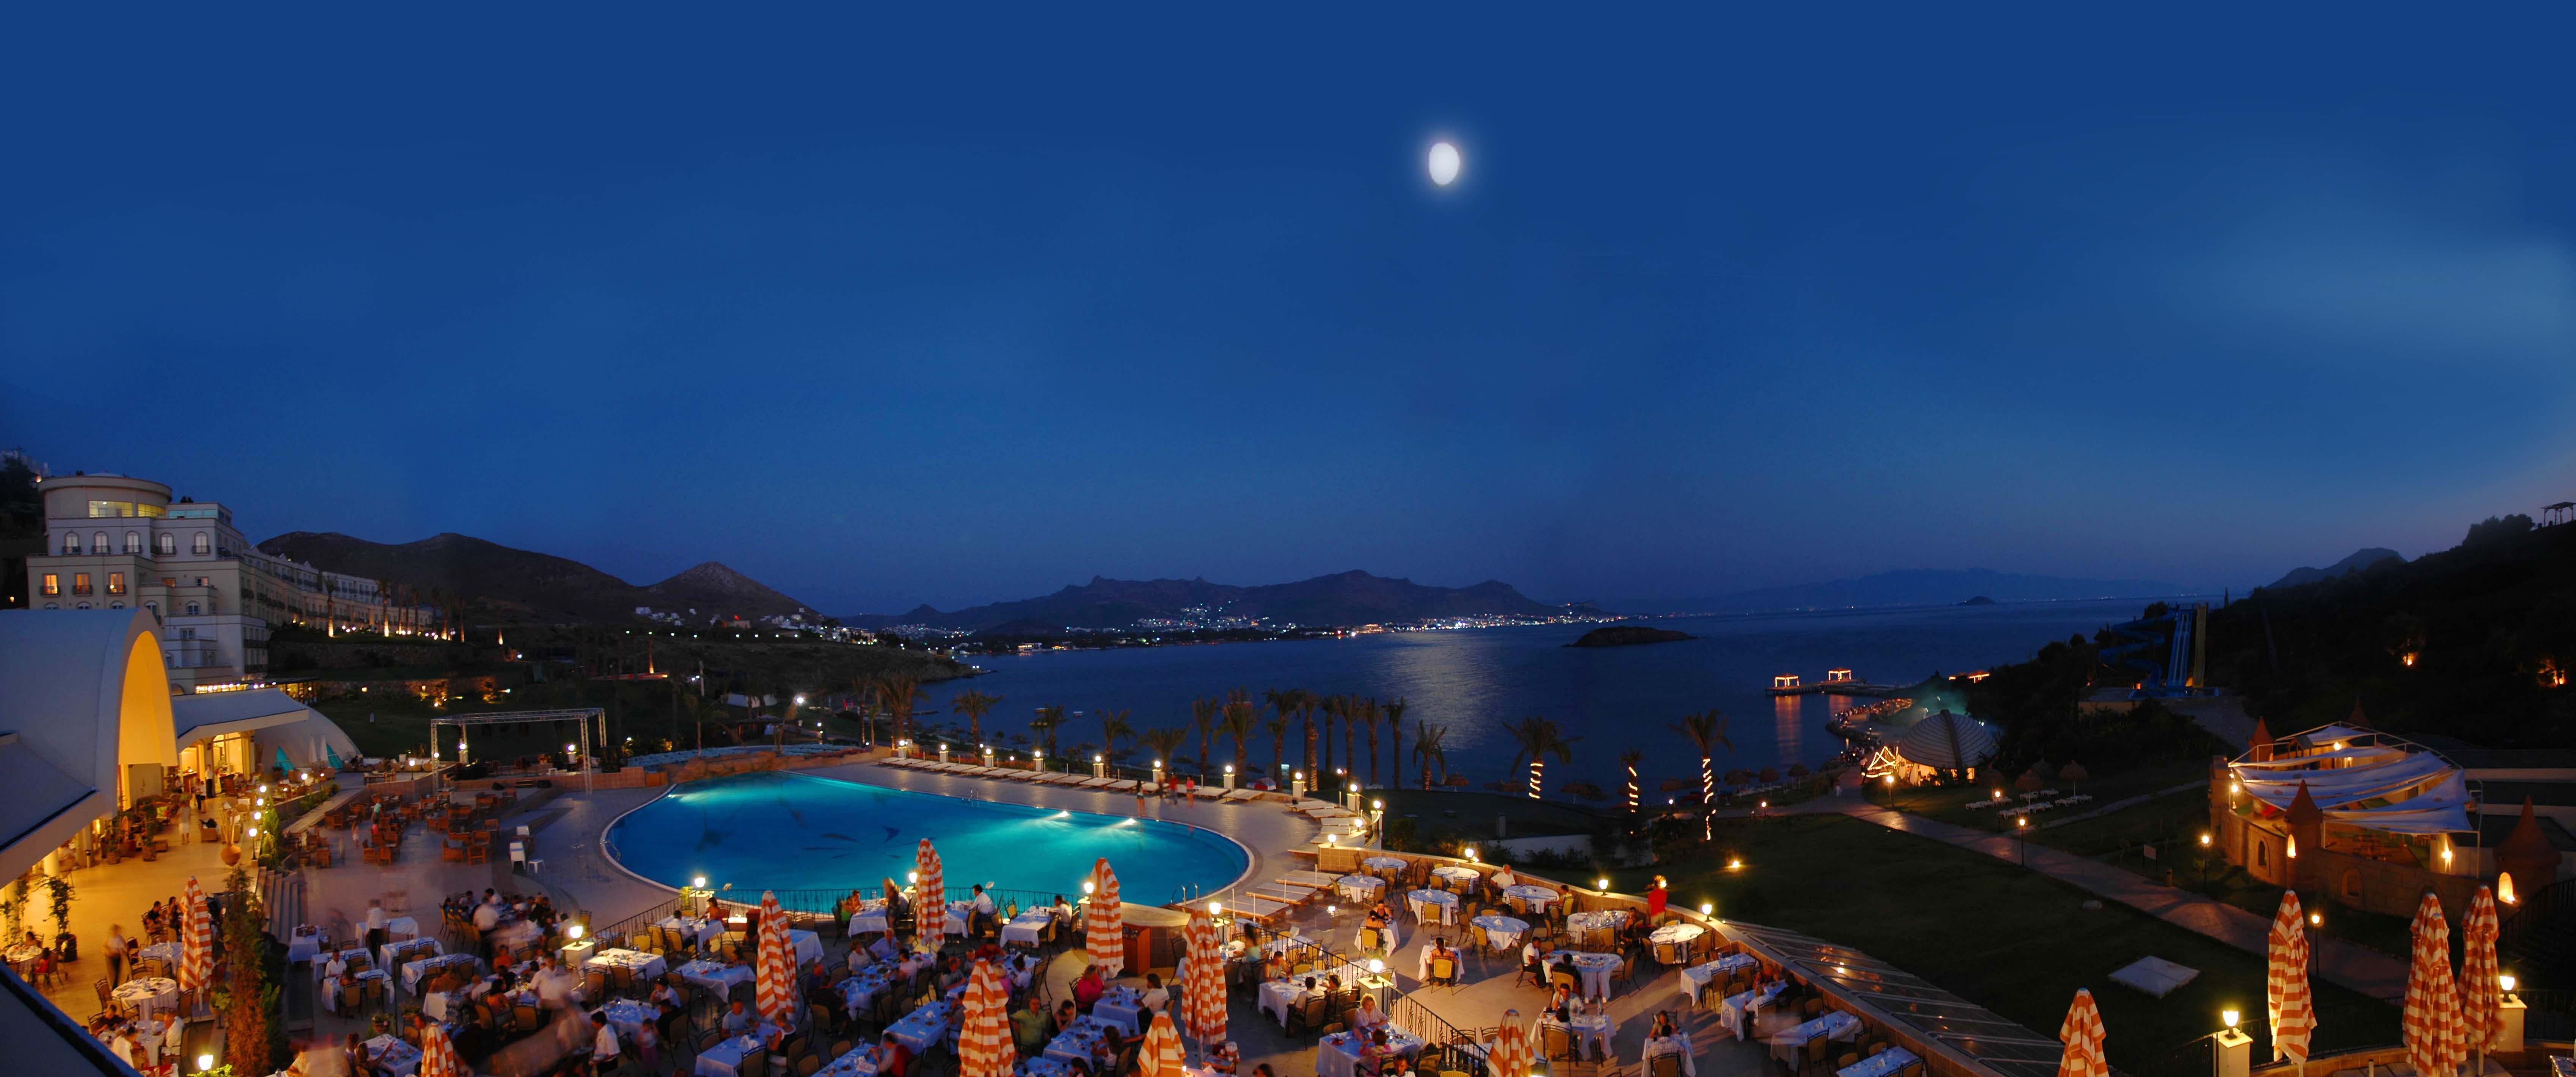 Free stock photo of night, ocean, holidays, hotel